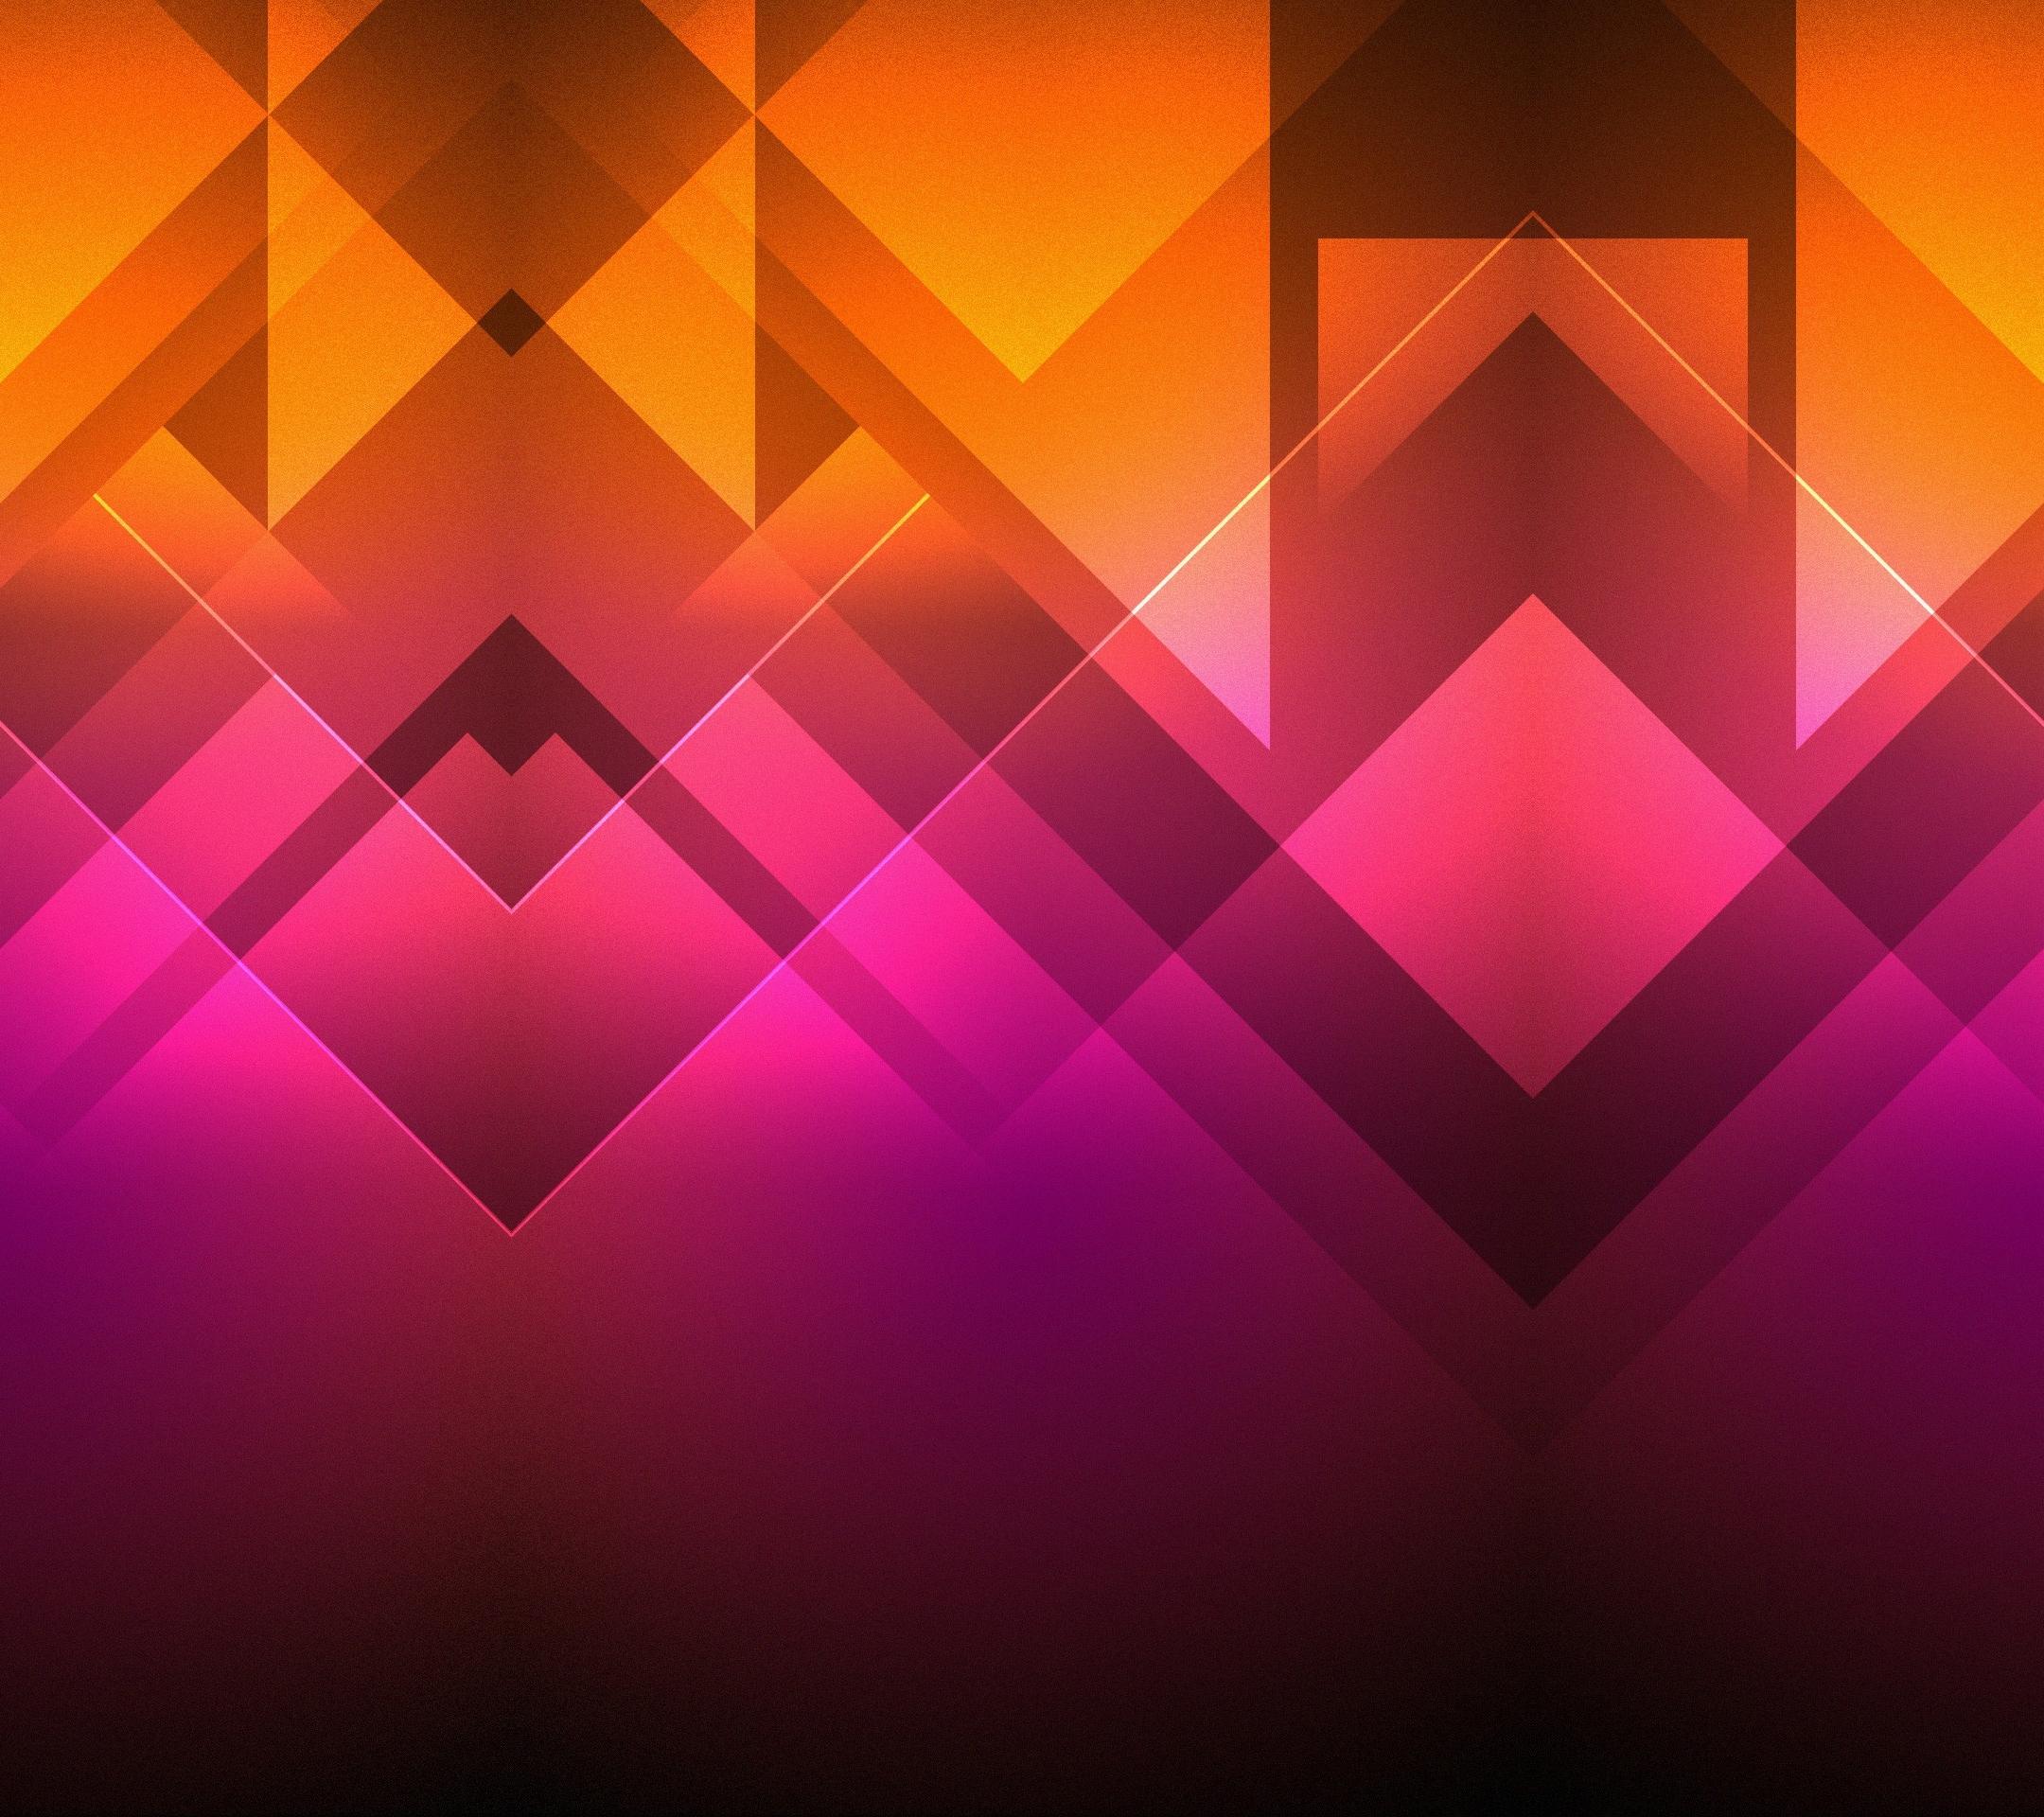 HTC_One_Max-wallpaper-10247604